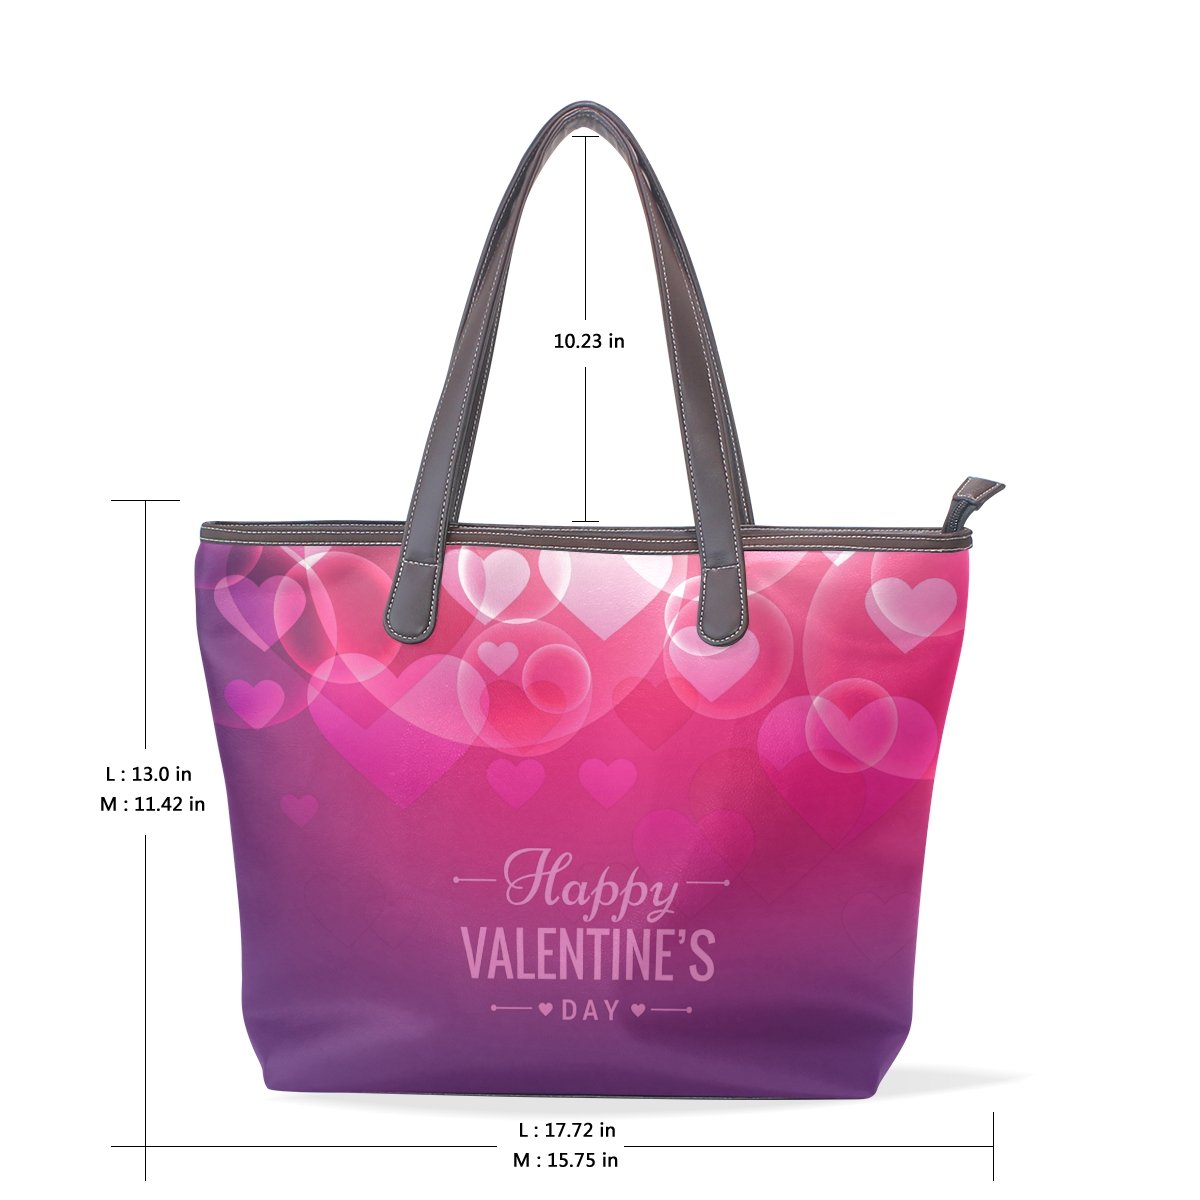 4a67eaf5cd Amazon.com | Happy Valentine's Day Women's Fashion Large Shoulder Bag  Handbag Tote Purse for Lady | Travel Totes